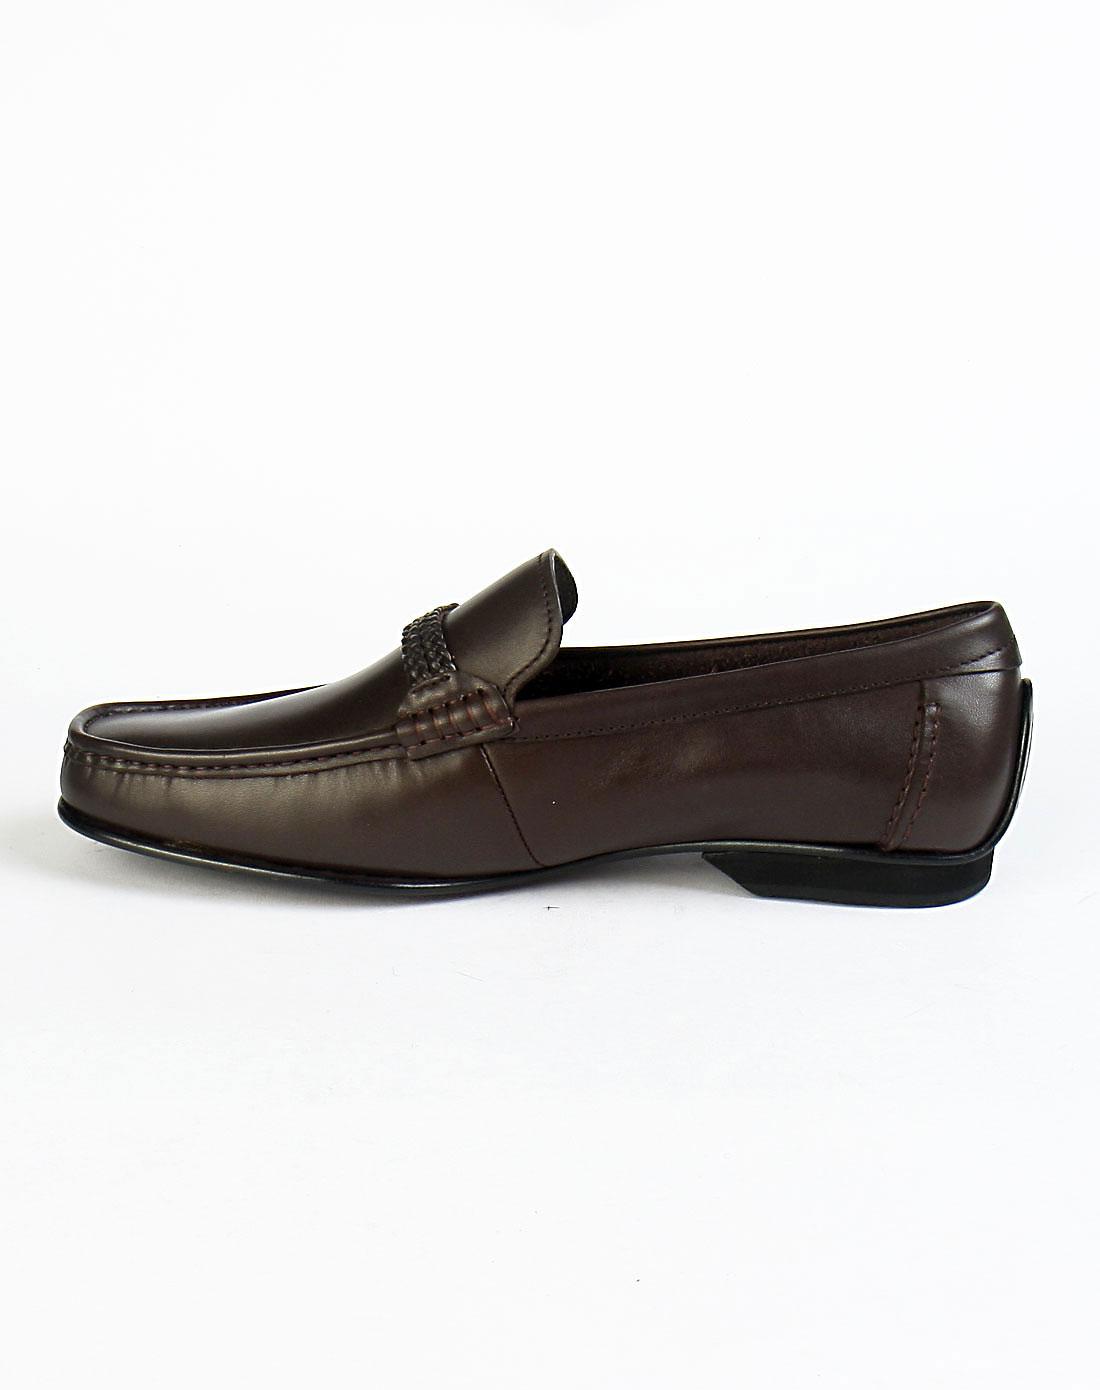 皇冠crown棕色商务系列男鞋21210220